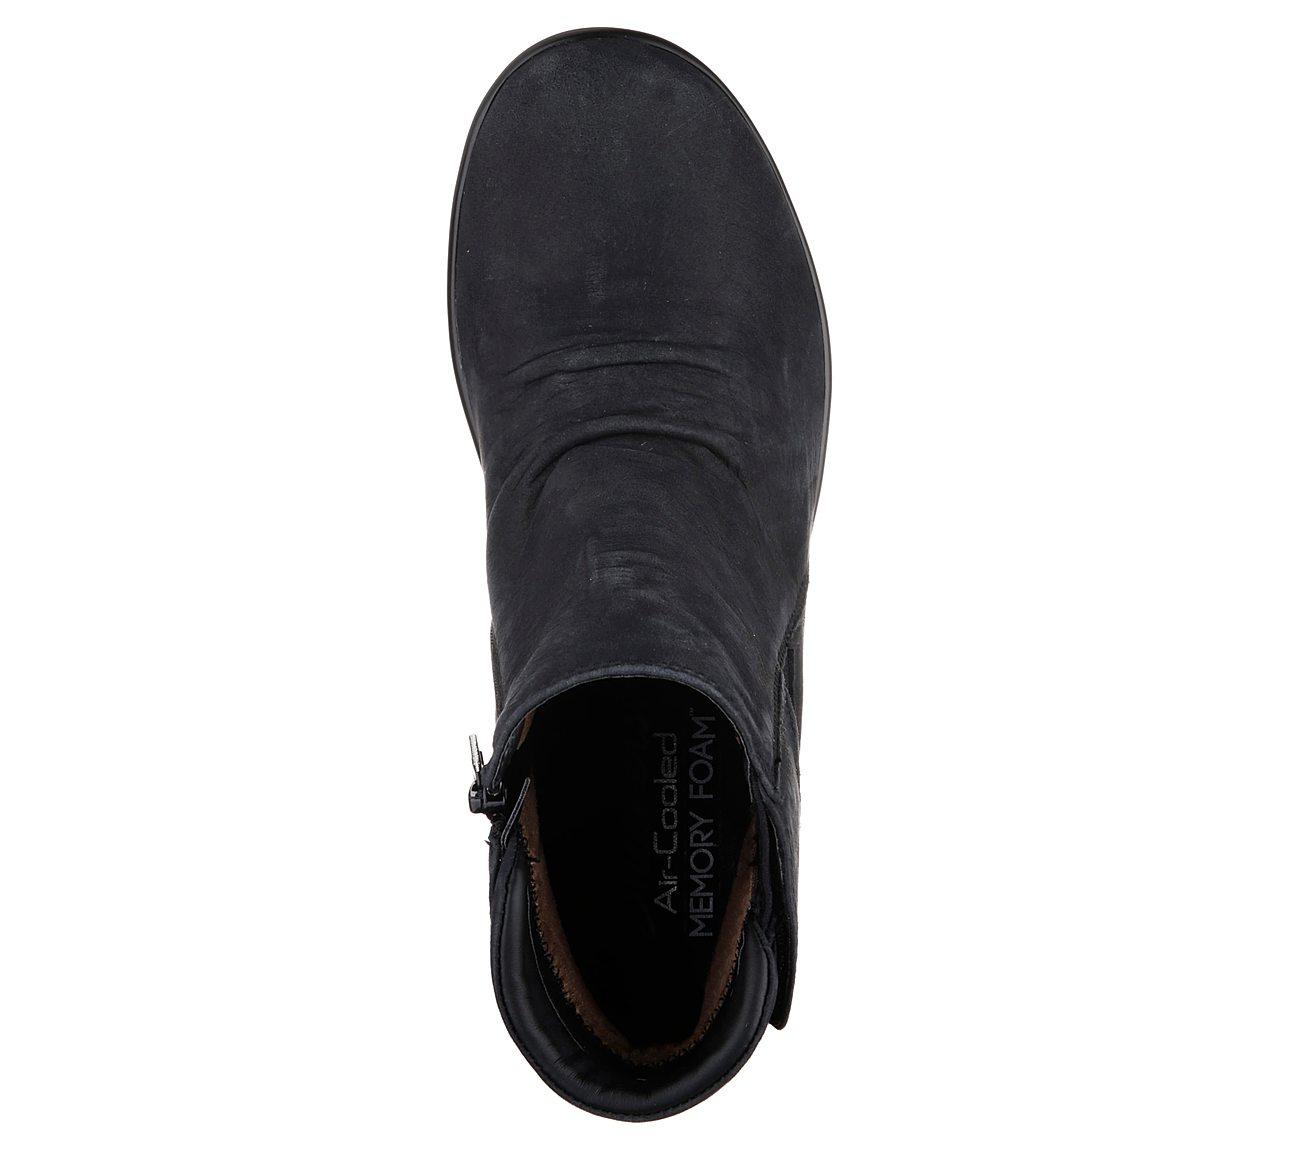 da65bc7450d0 Buy SKECHERS Parallel - Fastened SKECHERS Modern Comfort Shoes only ...